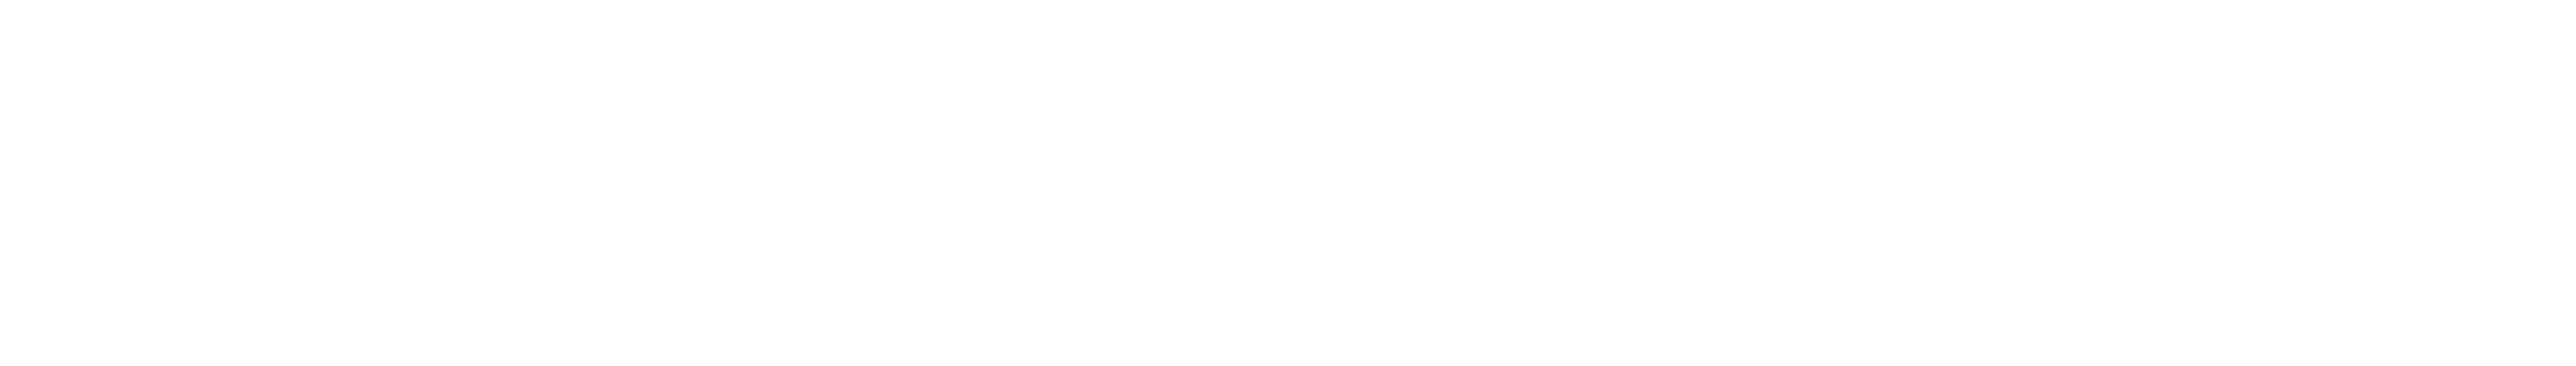 icon row